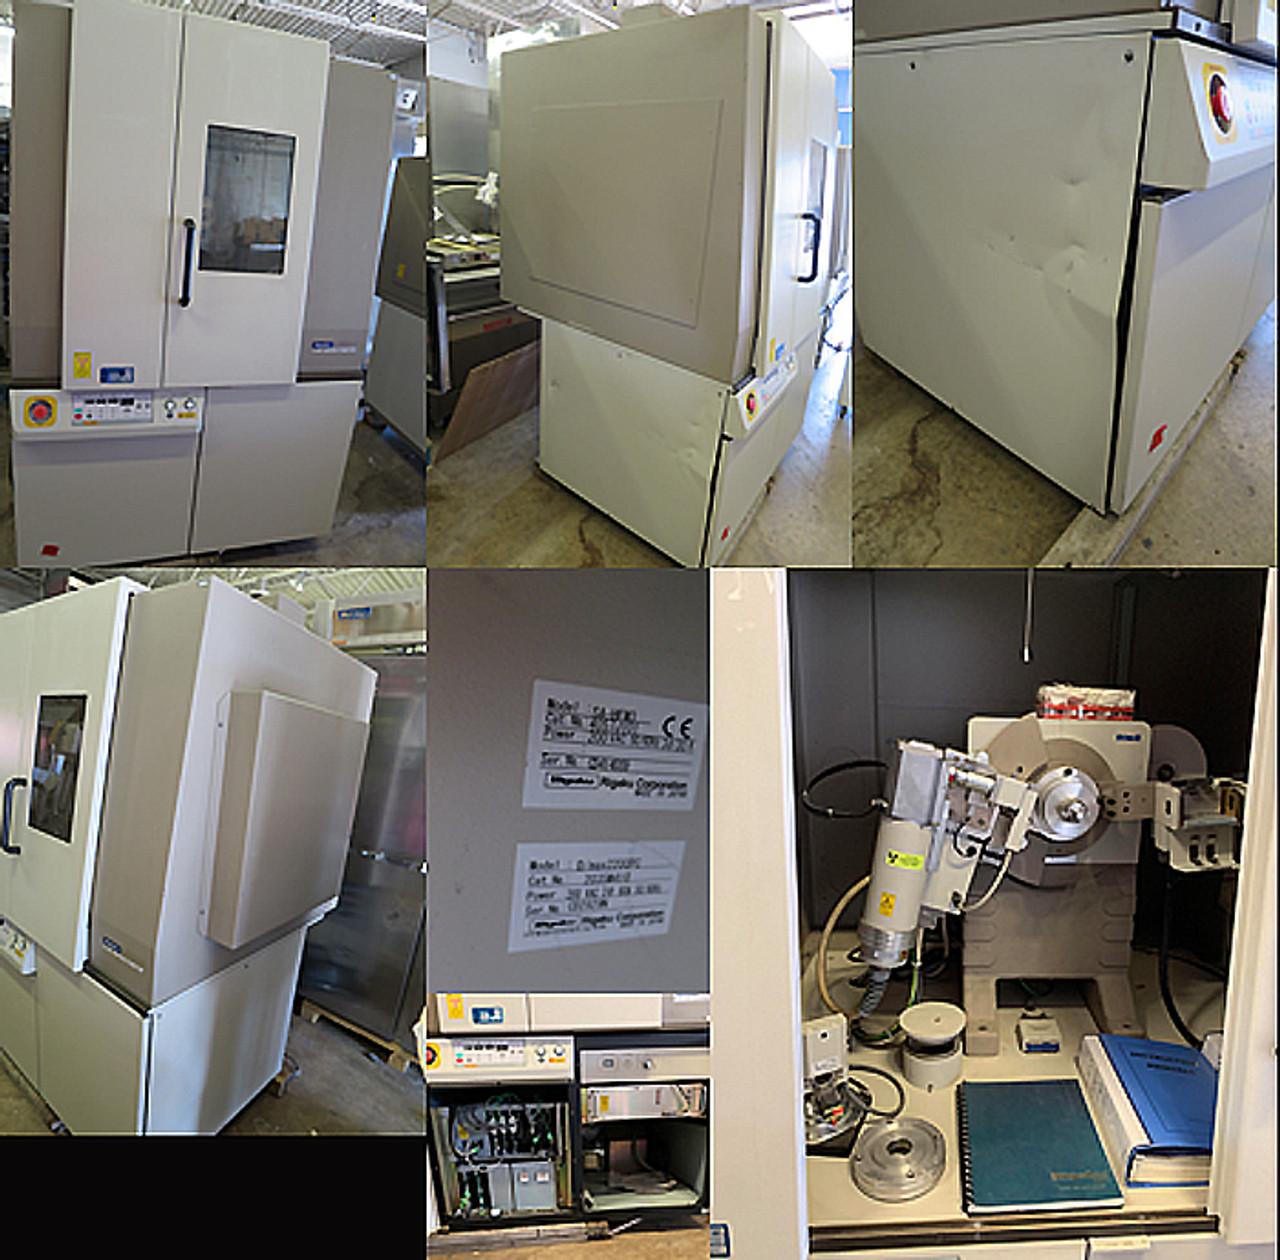 Lot of 2 Rigaku Ultima III X-Ray Diffractometer D/Max-2200 and SA-HFM3